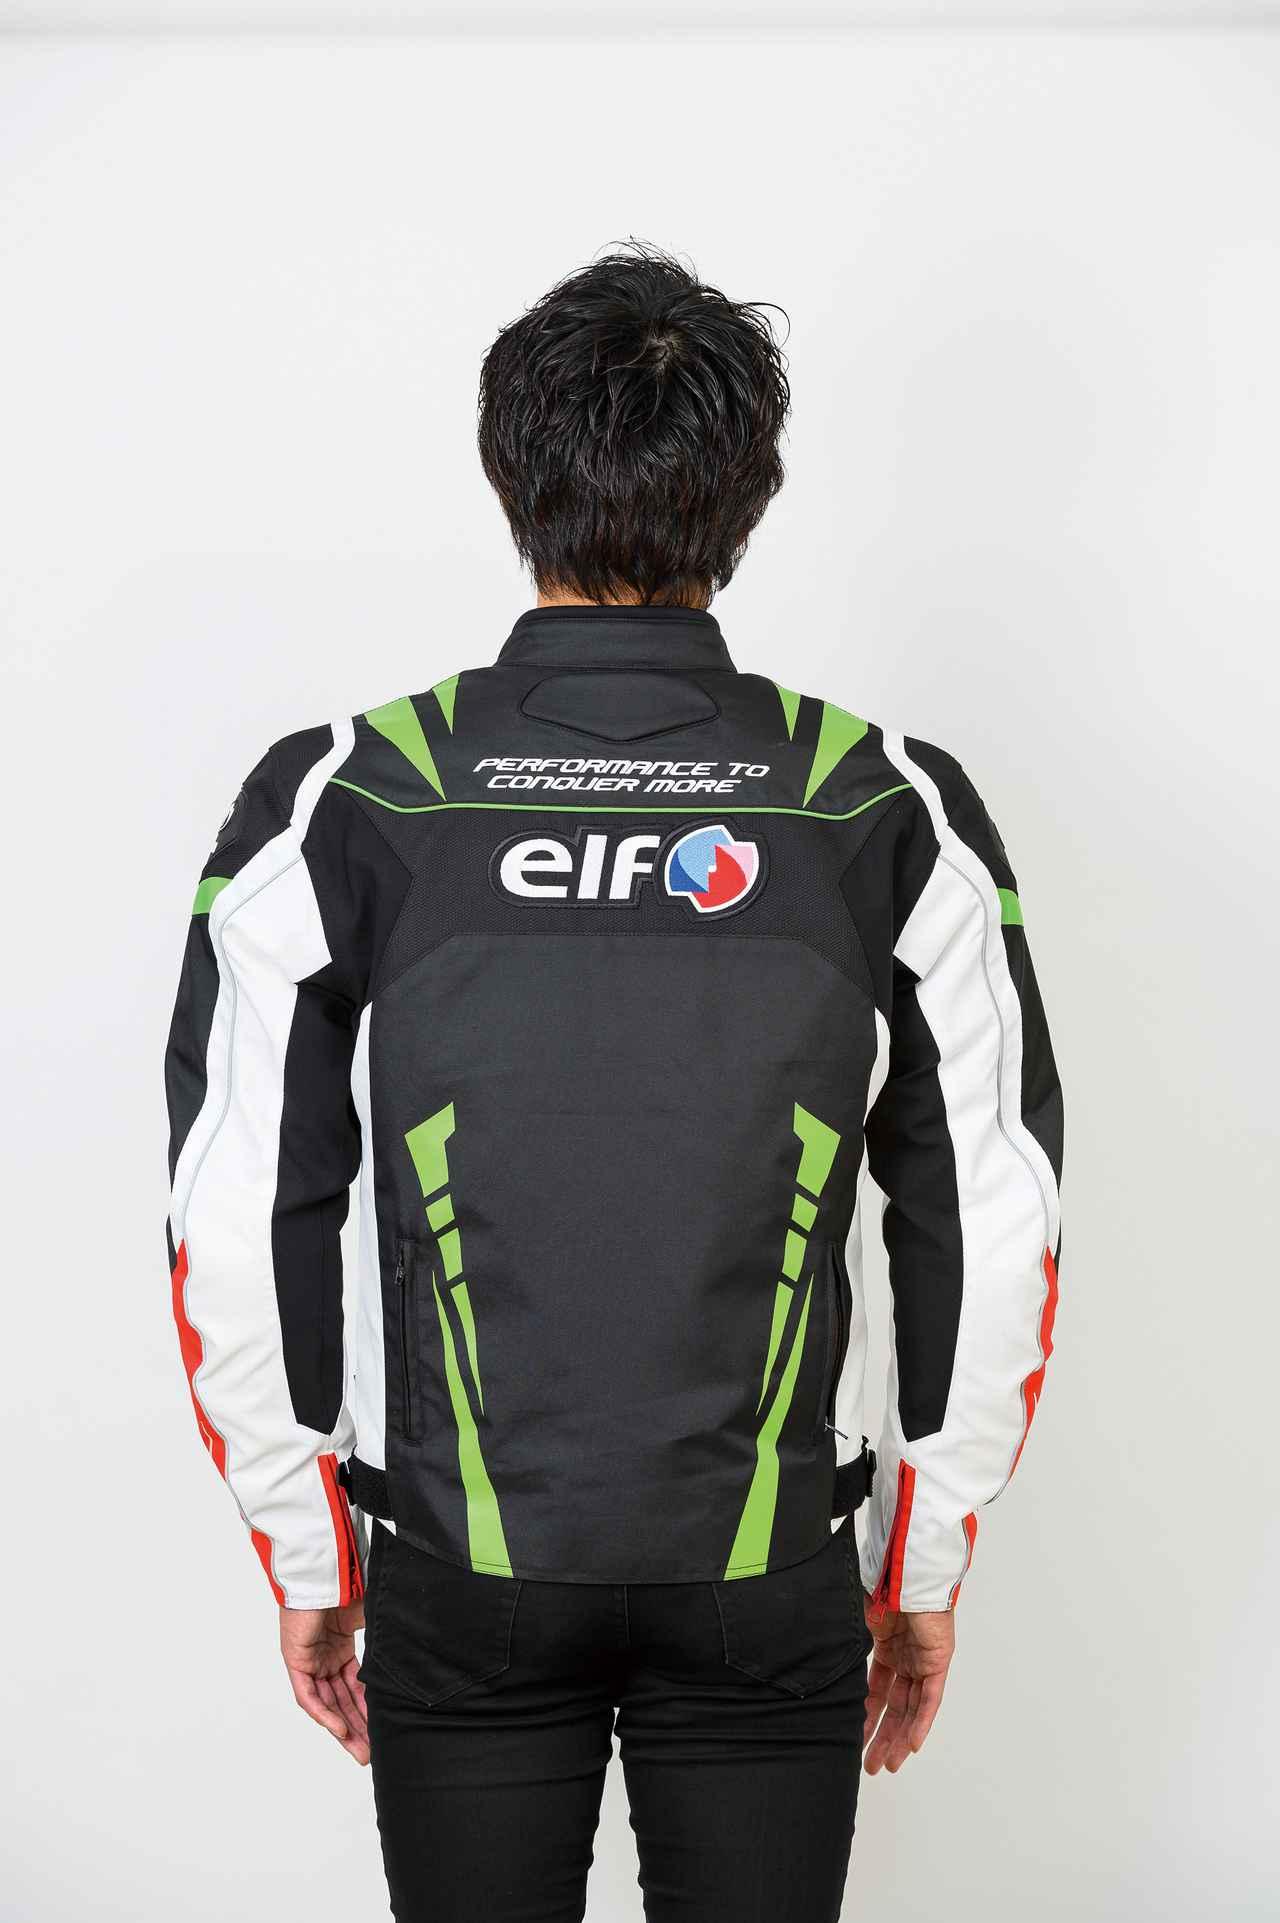 Images : 5番目の画像 - elf「EJ-W109 ヴィットリアスポルトジャケット」 - webオートバイ